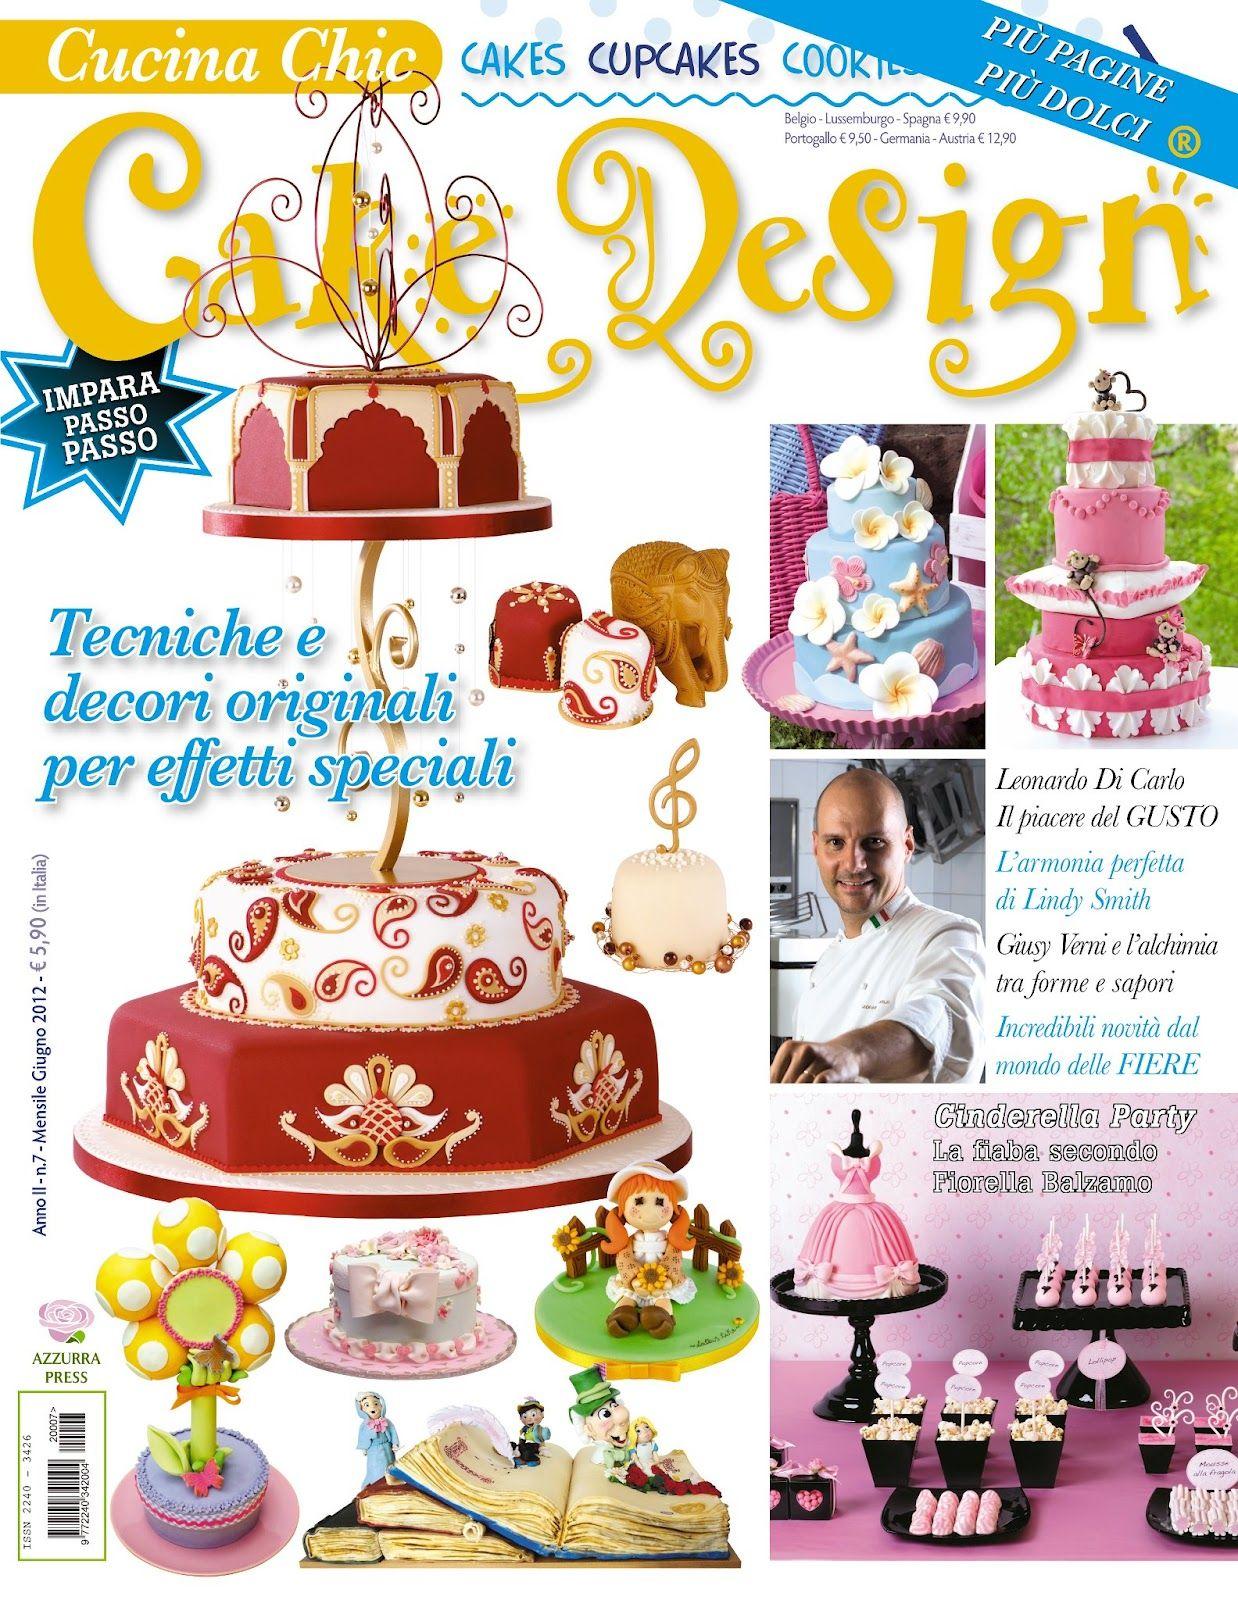 Rivista cucina chic cake design – Disegni di Natale 2019